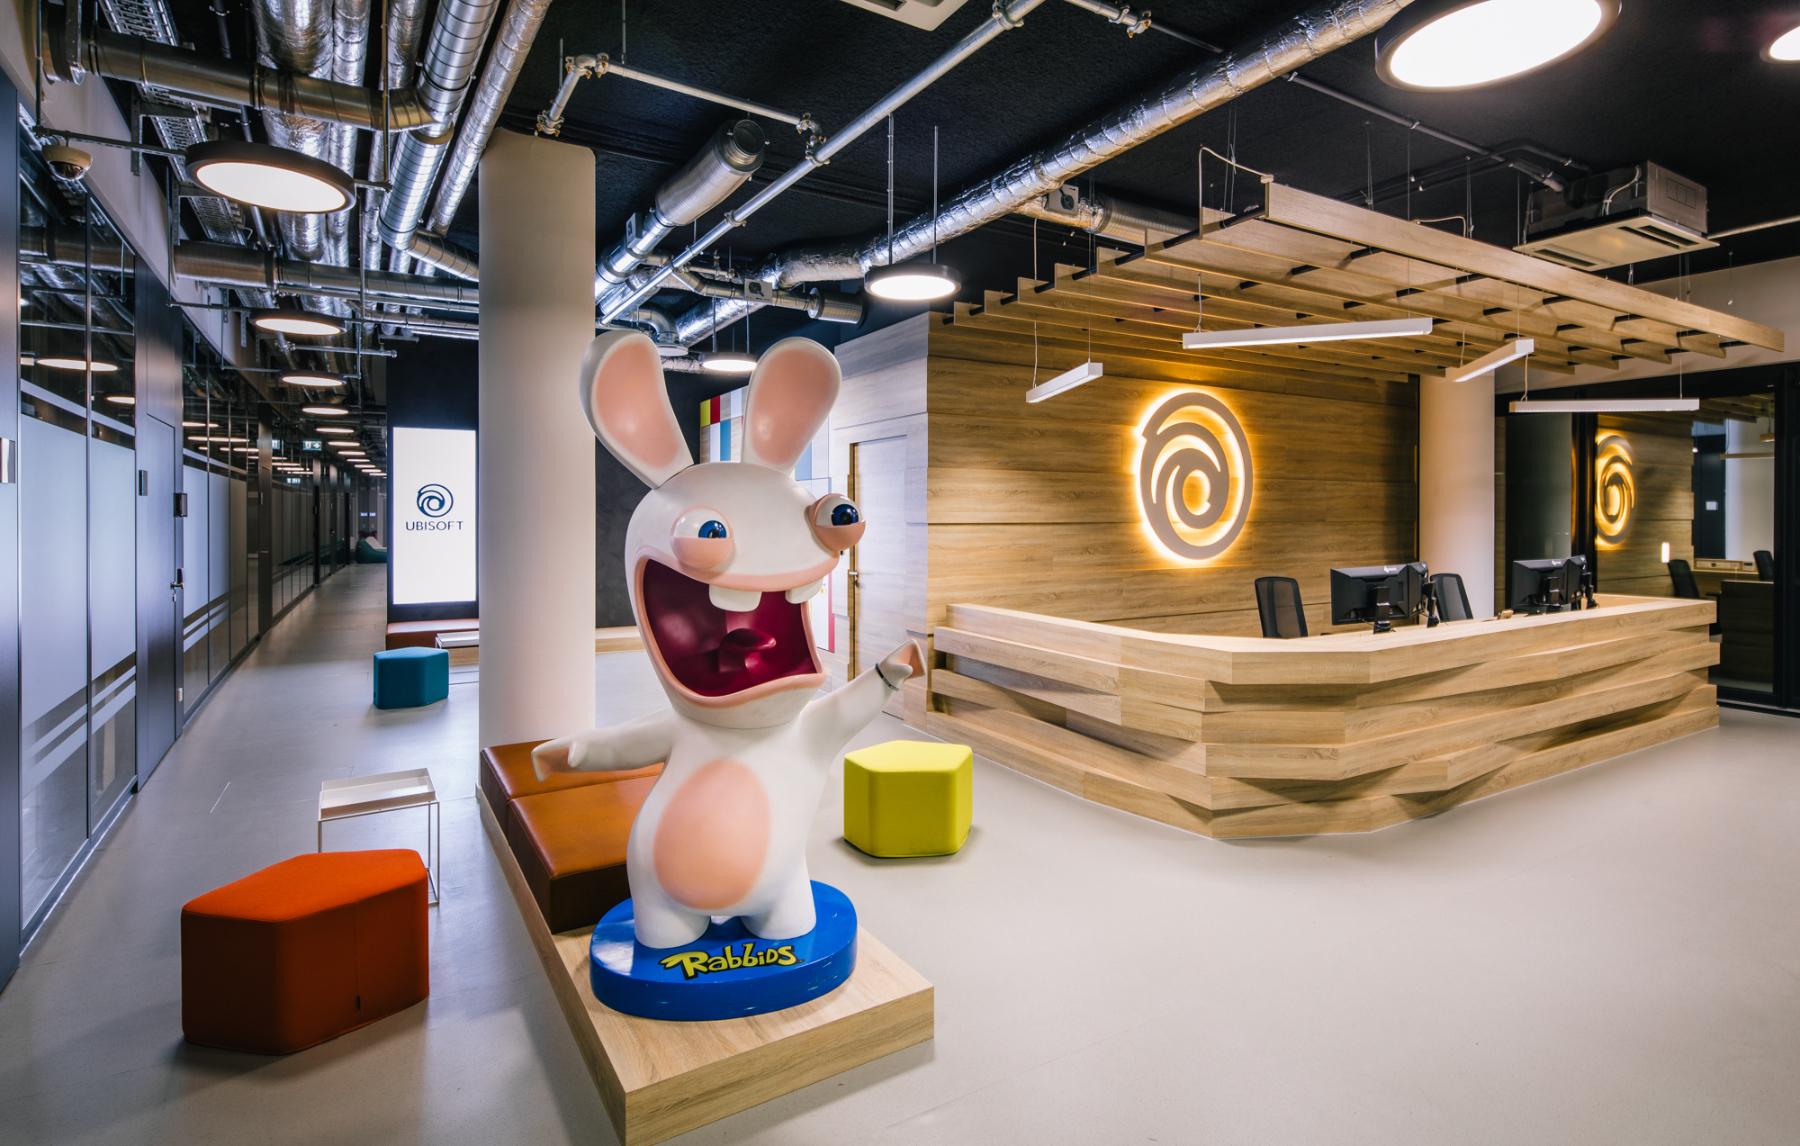 A Tour of Ubisoft's New Düsseldorf Office